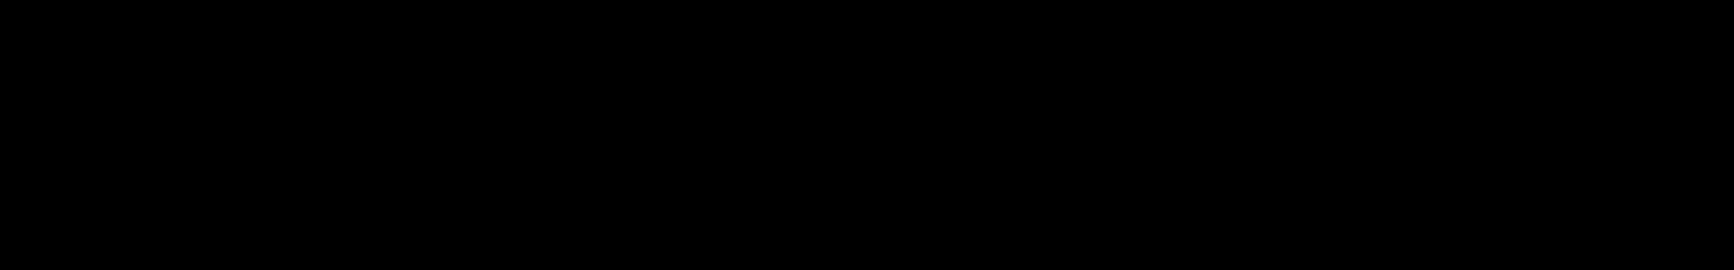 MPxRafSarmento_logo_black.png